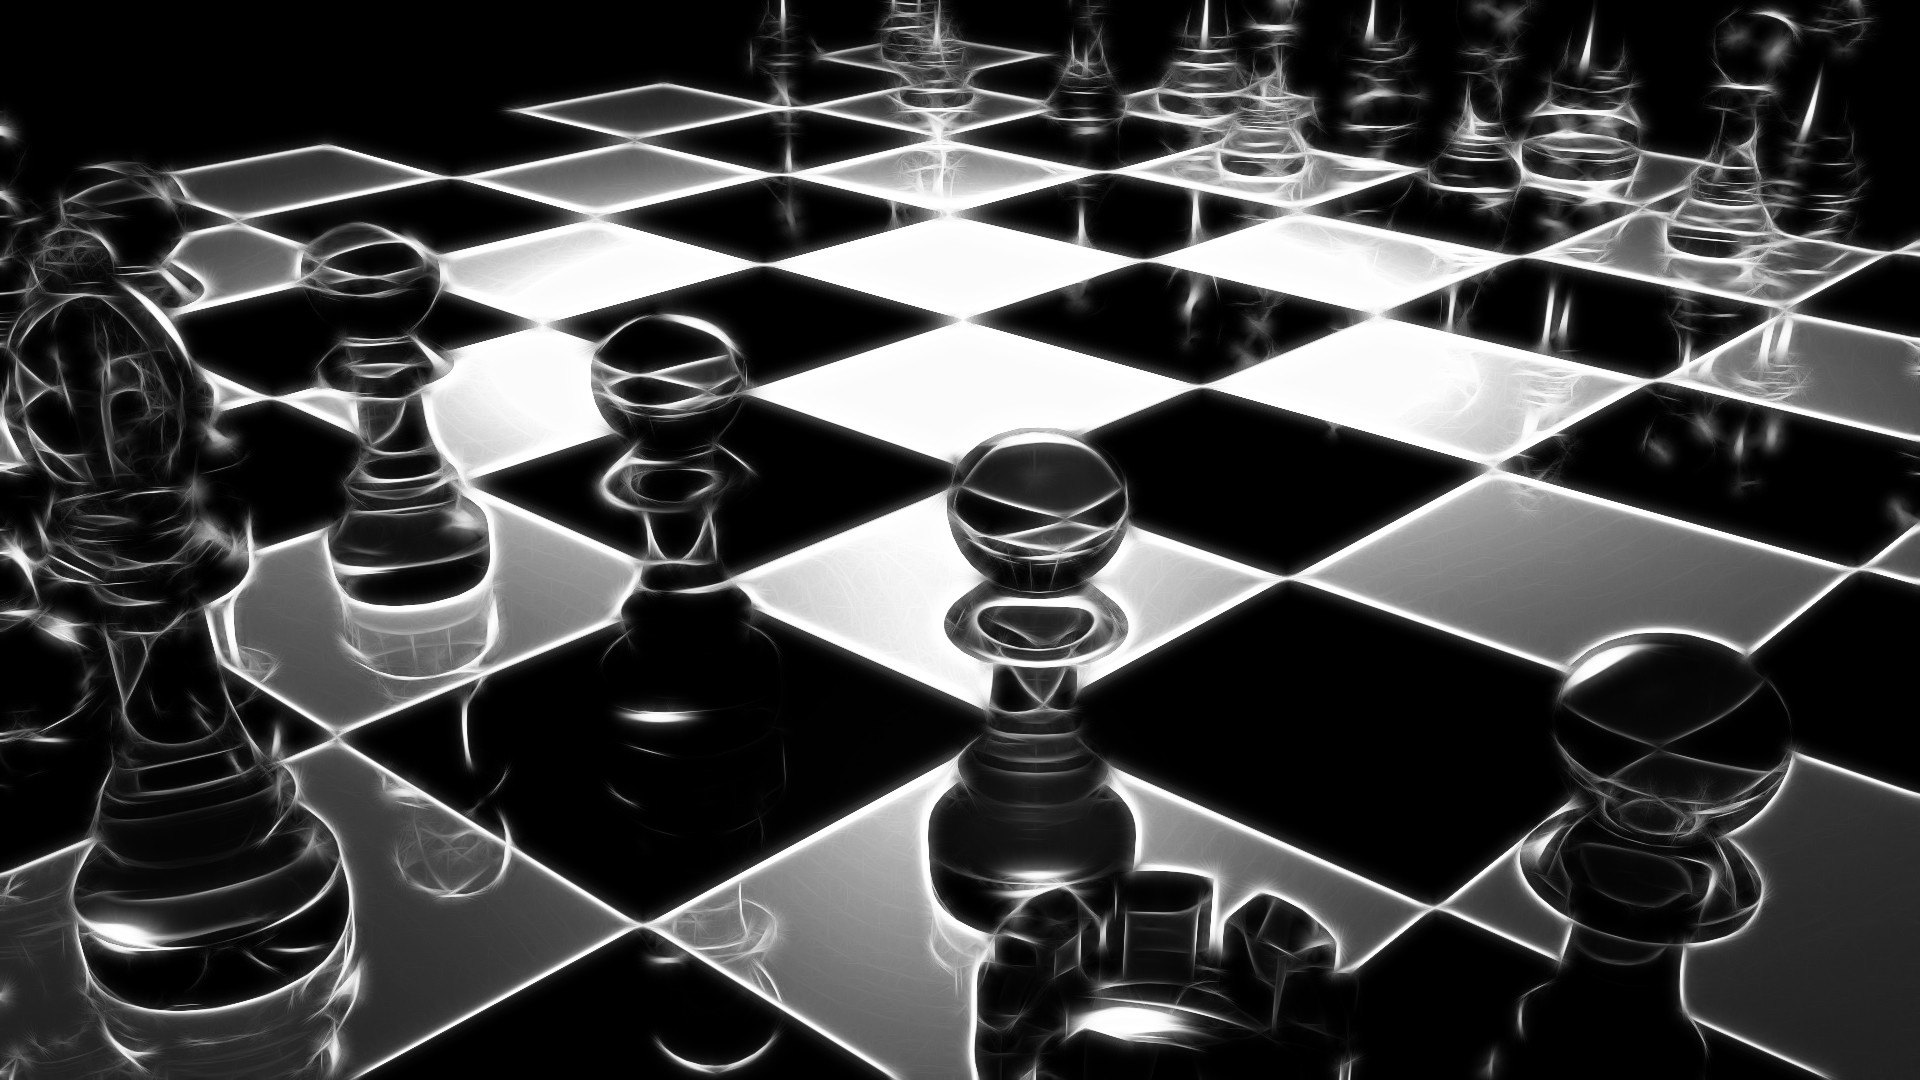 Chess Wallpaper (76+ images)  Chess Wallpaper...